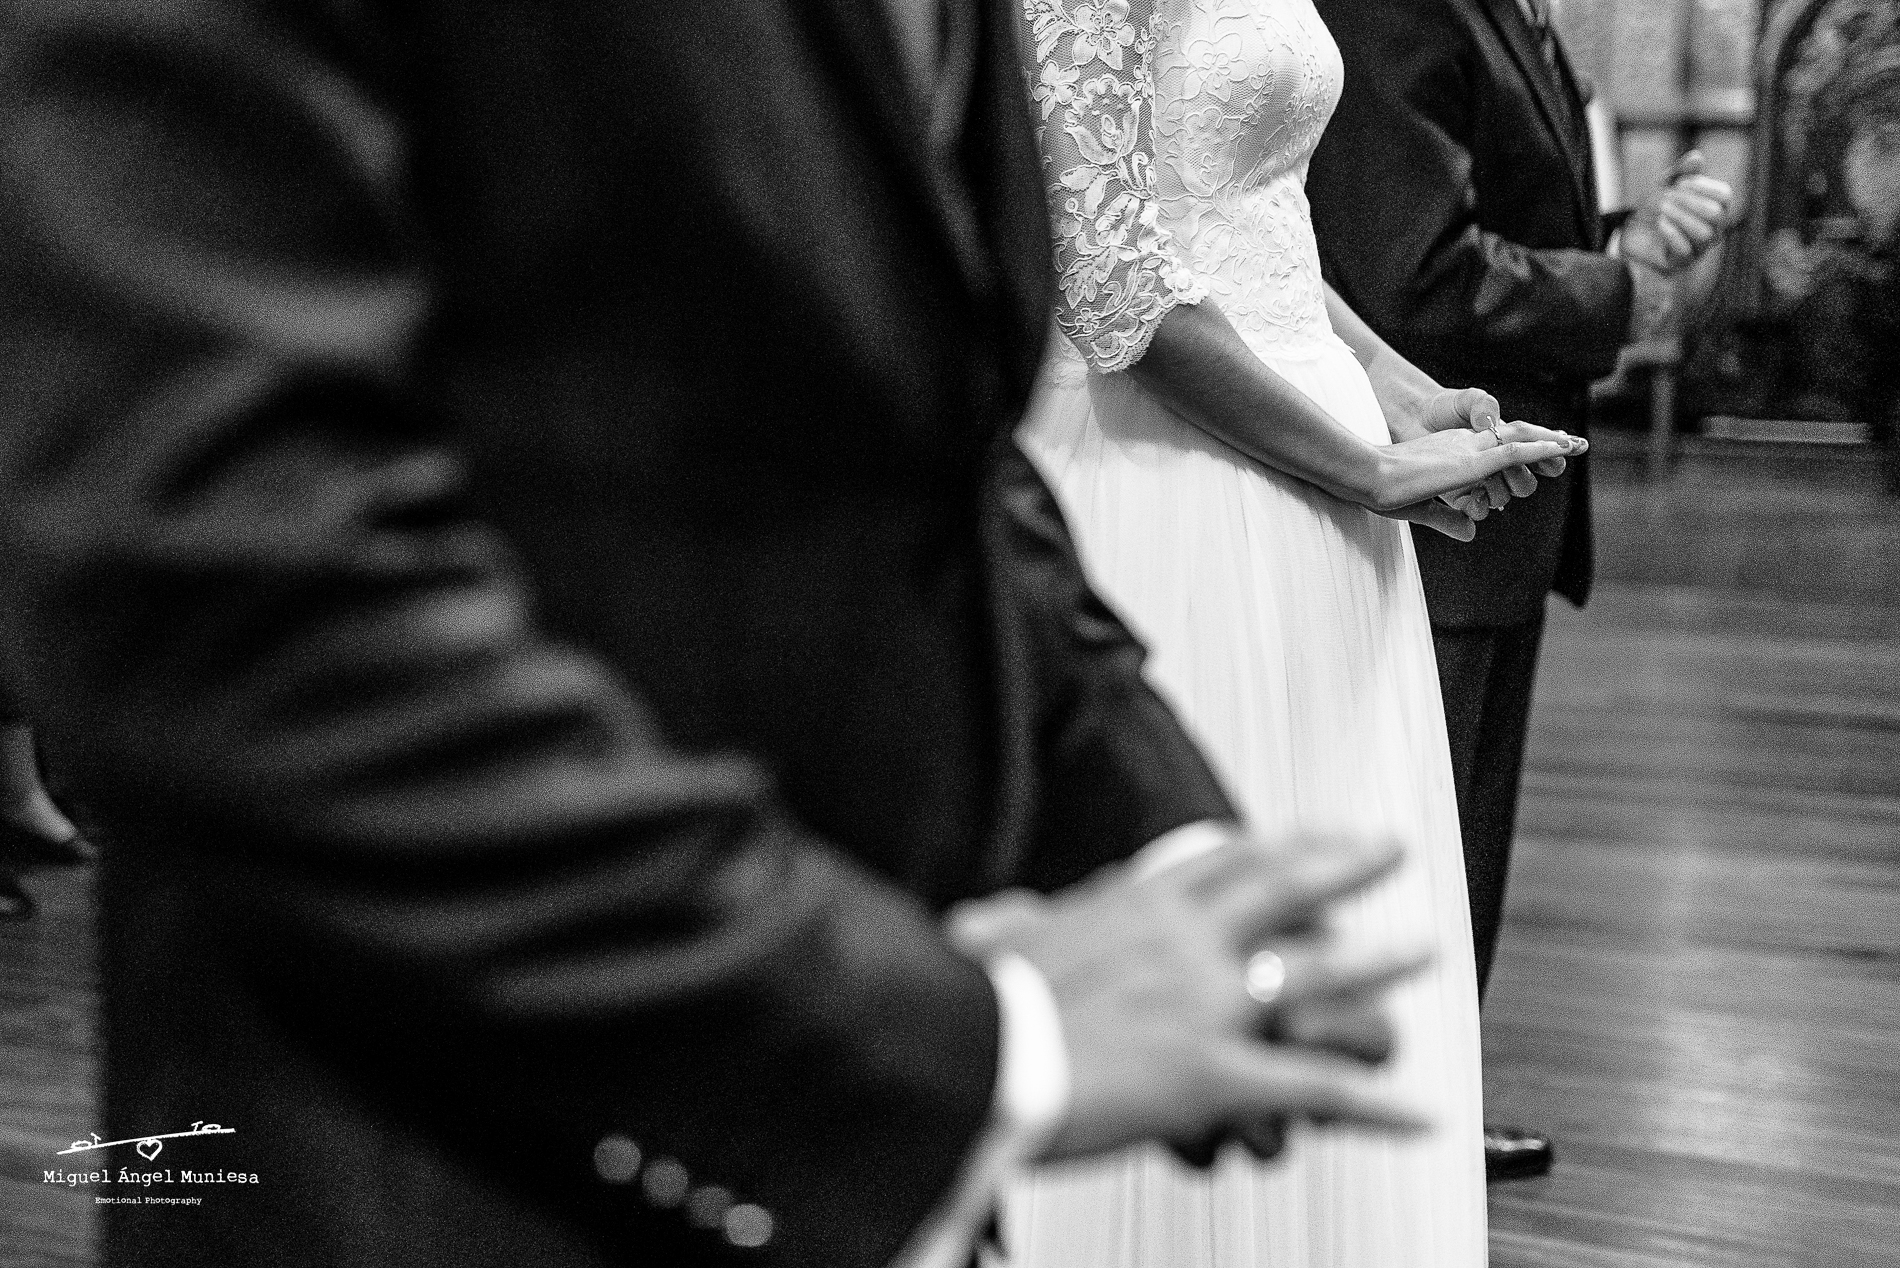 miguel angel muniesa, fotografo boda Teruel, fotografo boda navarra, fotografo boda zaragoza, fotografo boda soria, miguel angel muniesa emotional photography_14